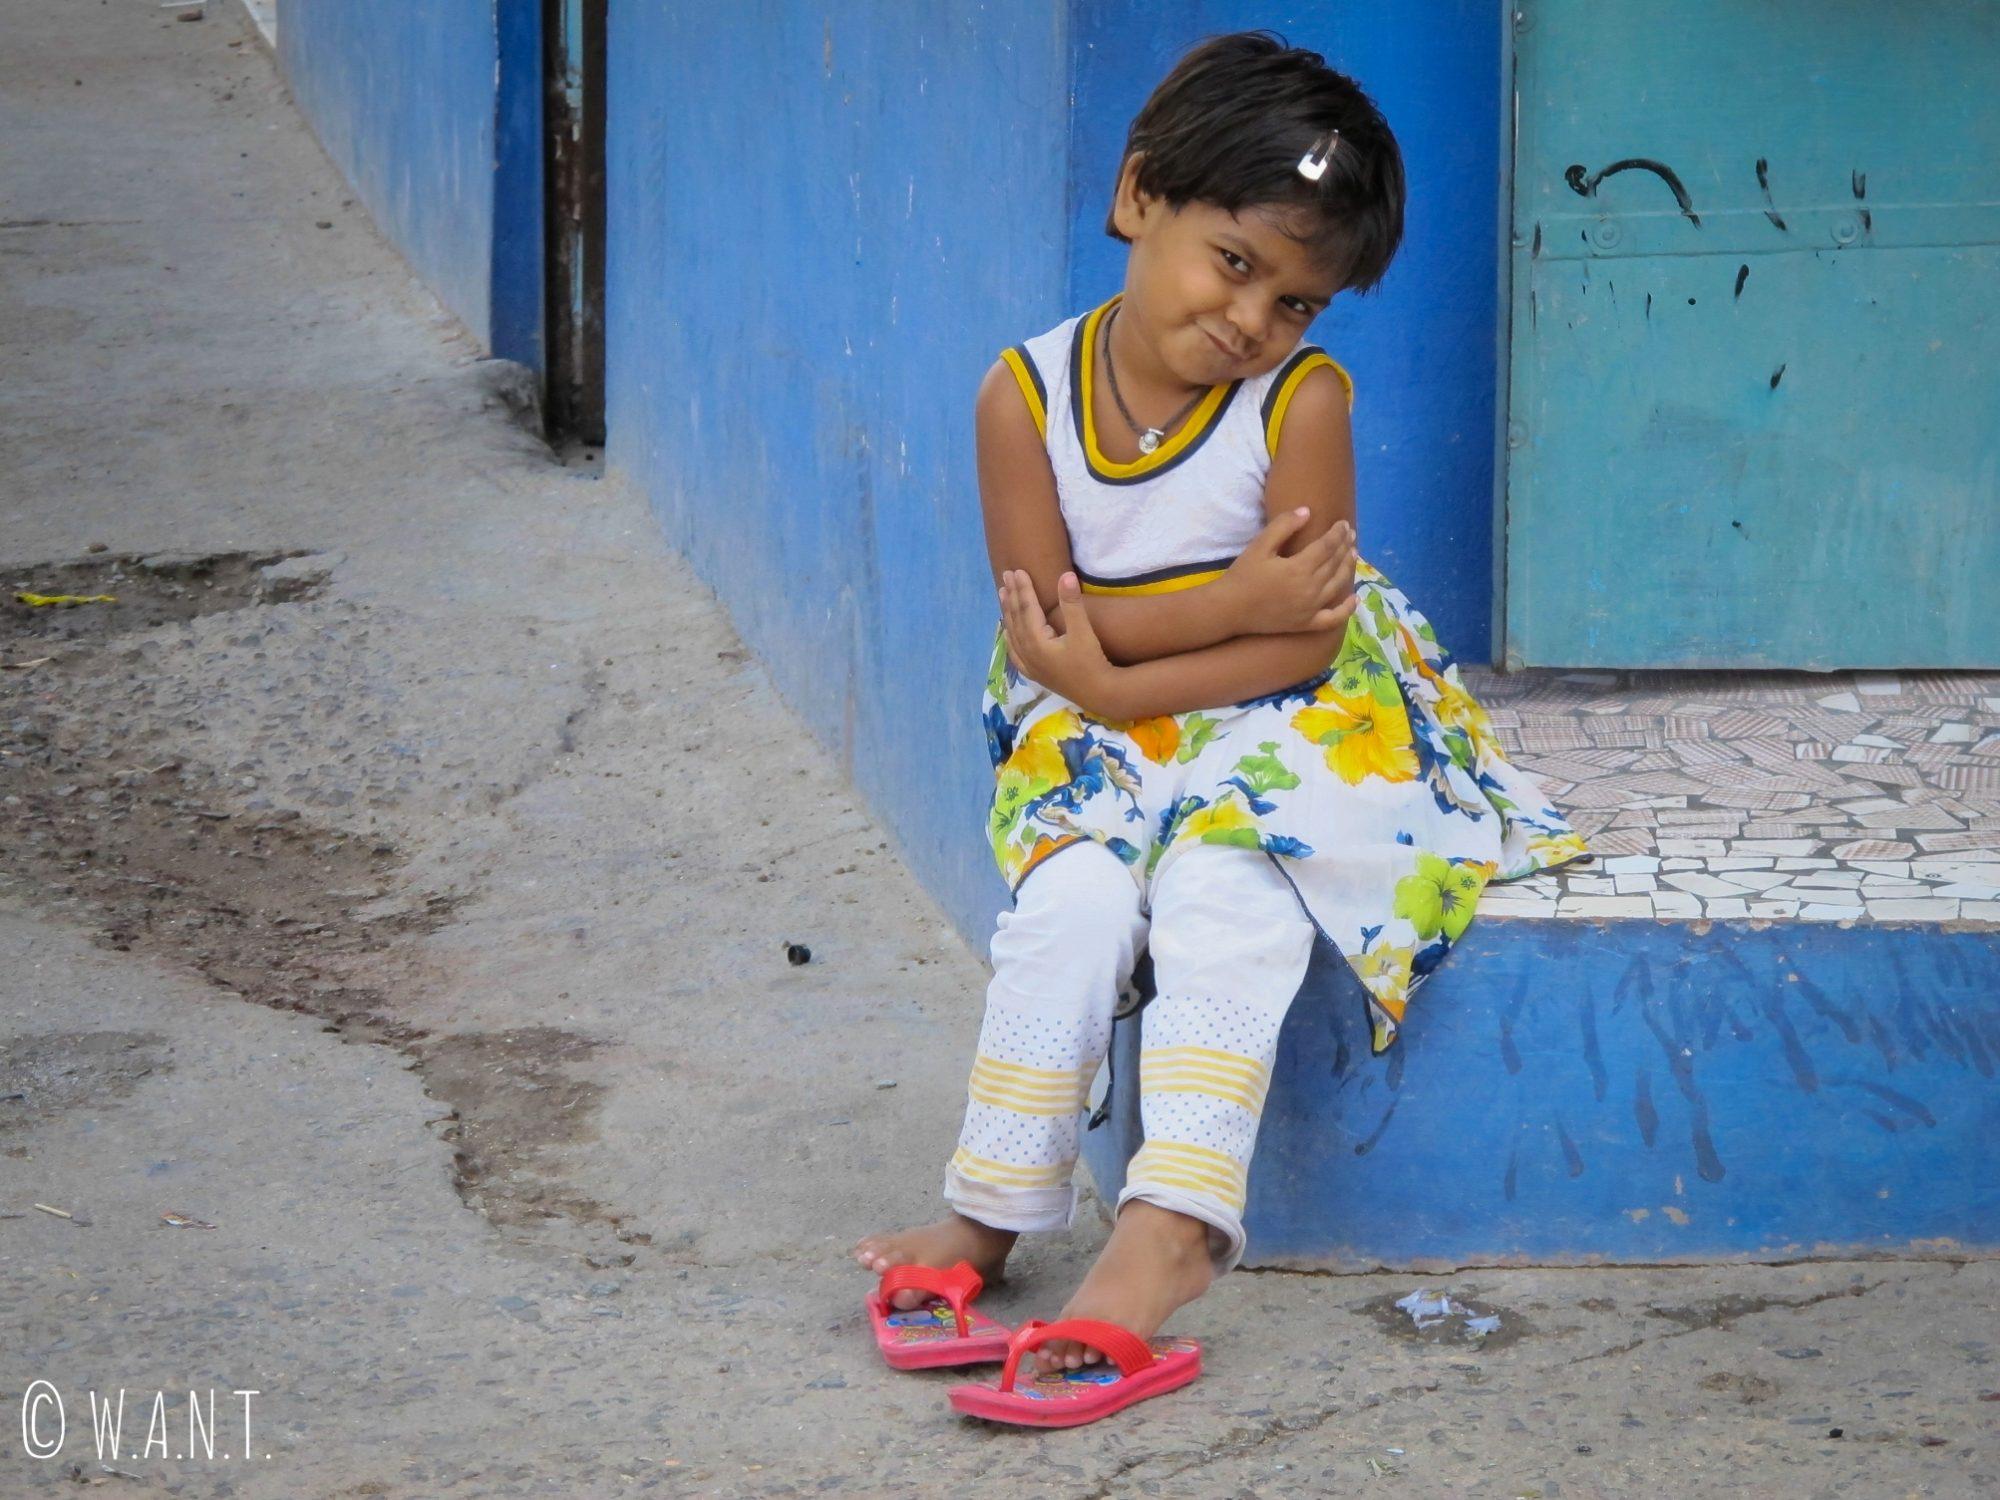 Petite fille prenant la pose sous l'objectif de Benjamin dans les rues de Jodhpur